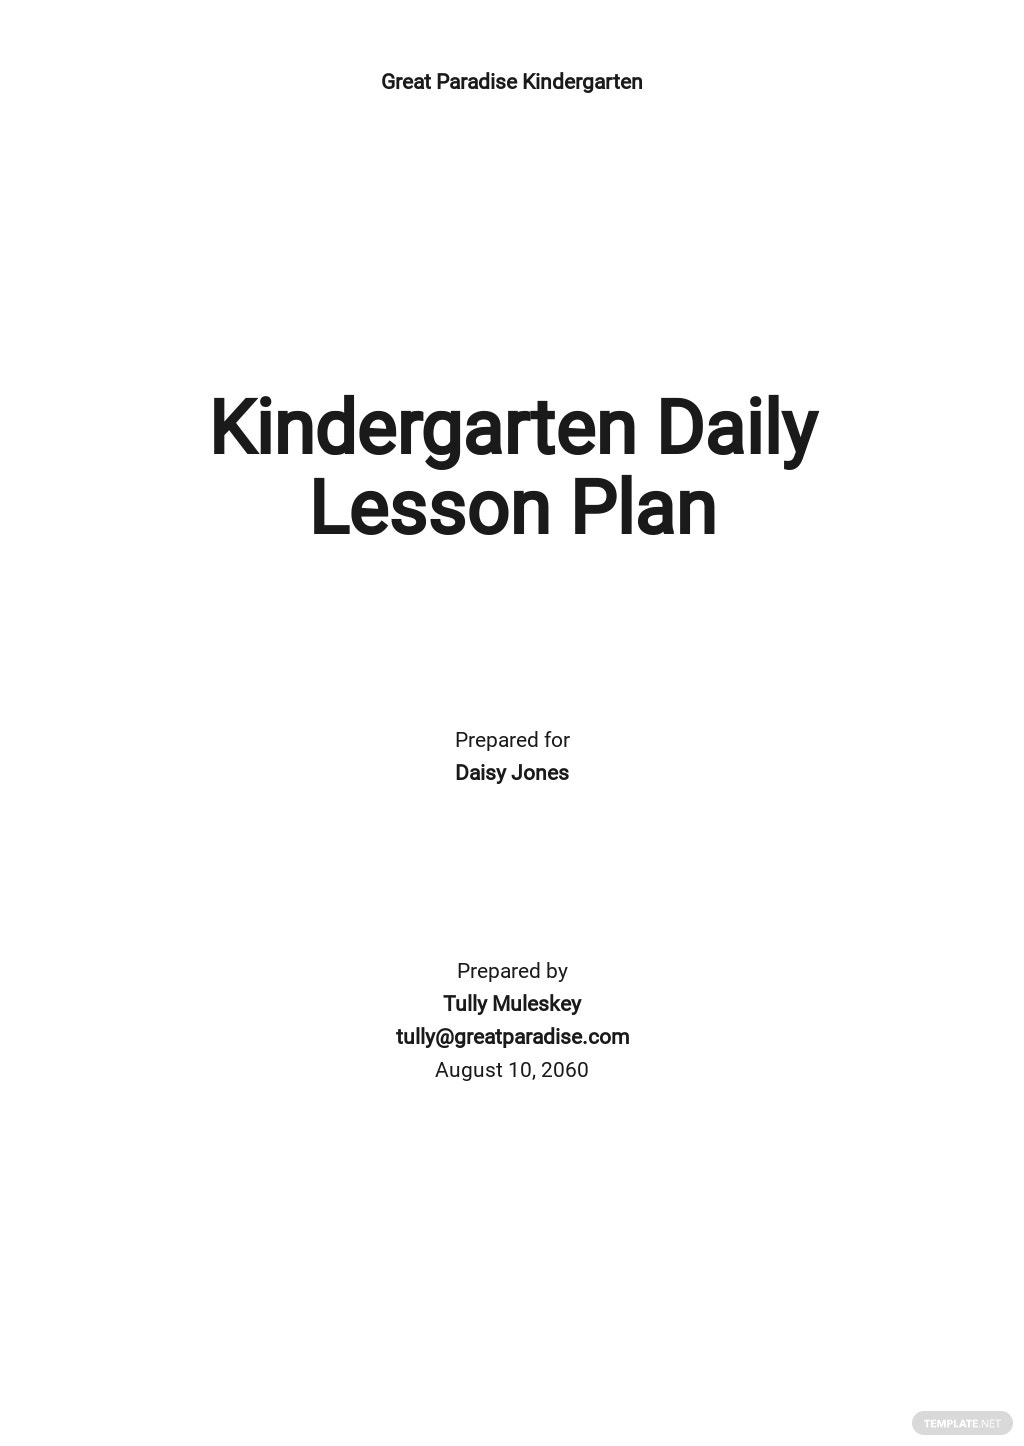 Kindergarten Daily Lesson Plan Template.jpe